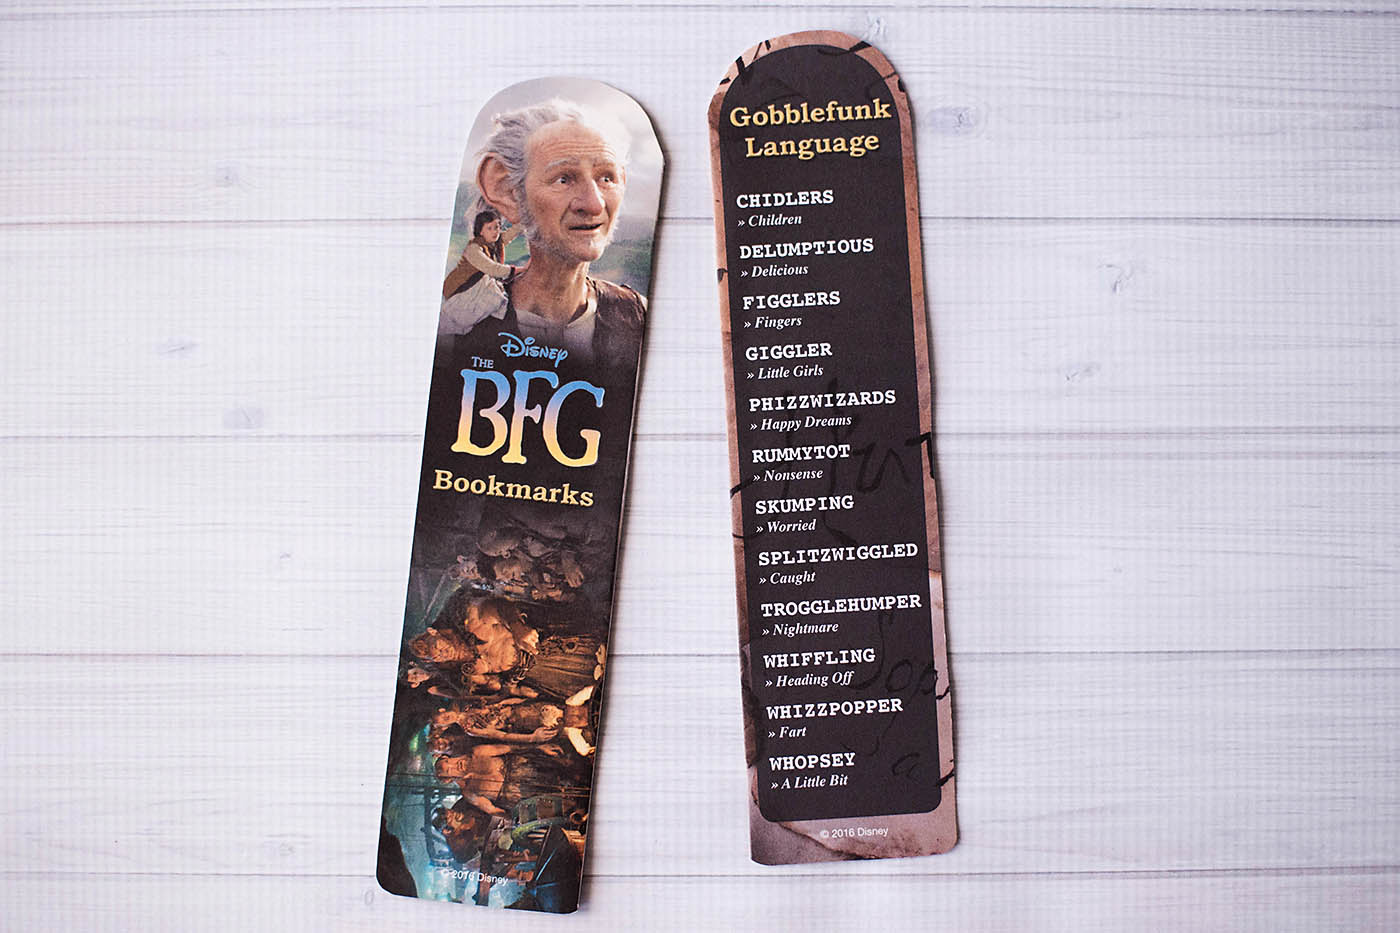 The BFG printable bookmarks